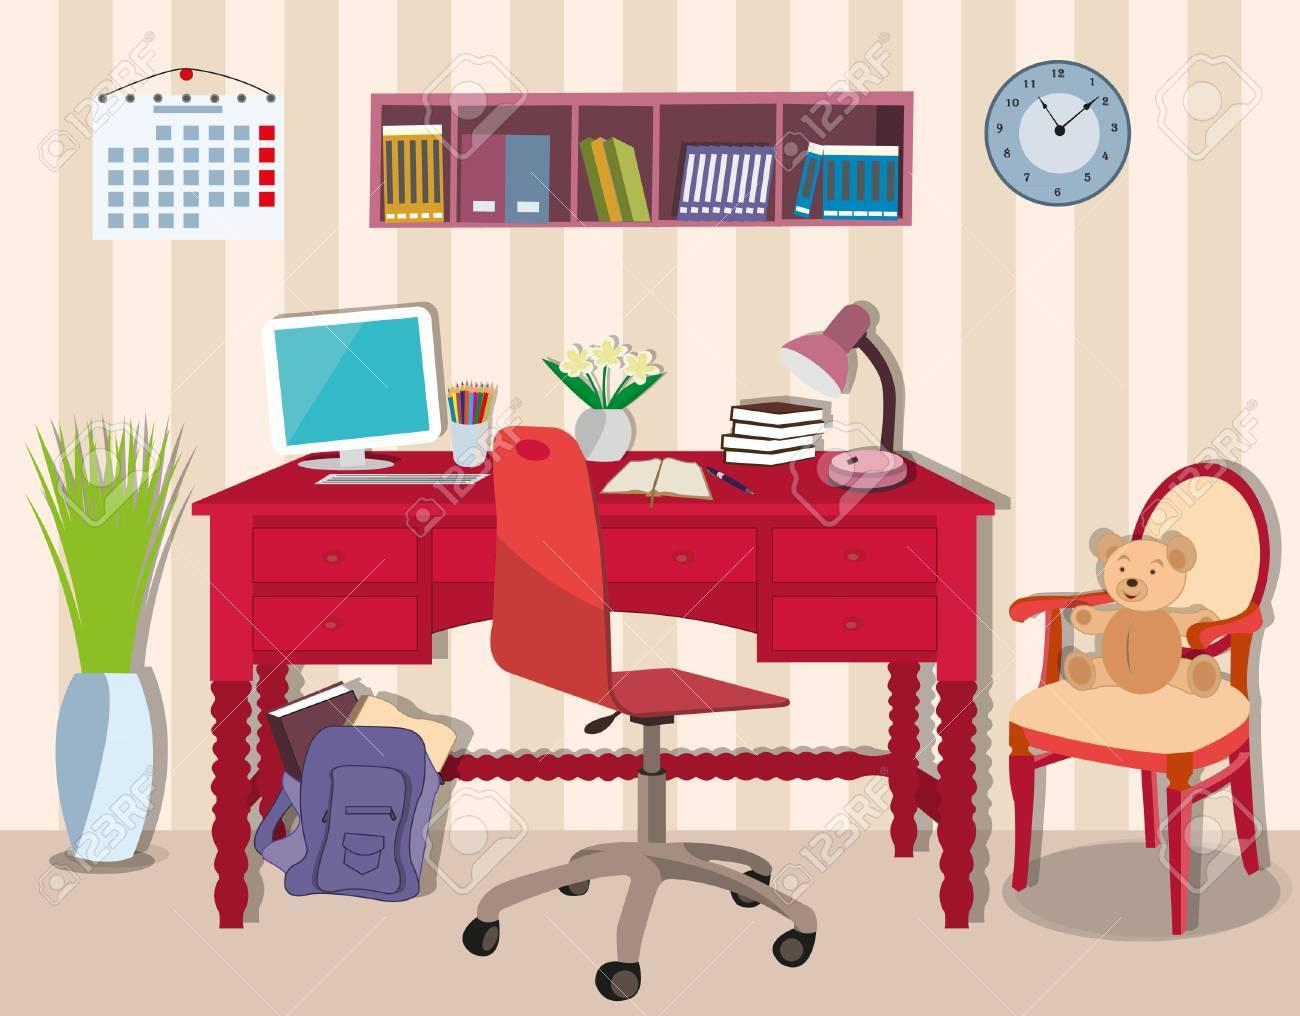 Moderne Lampen 75 : Moderner kühler jugendlichraum mit arbeitsplatztabelle stuhl